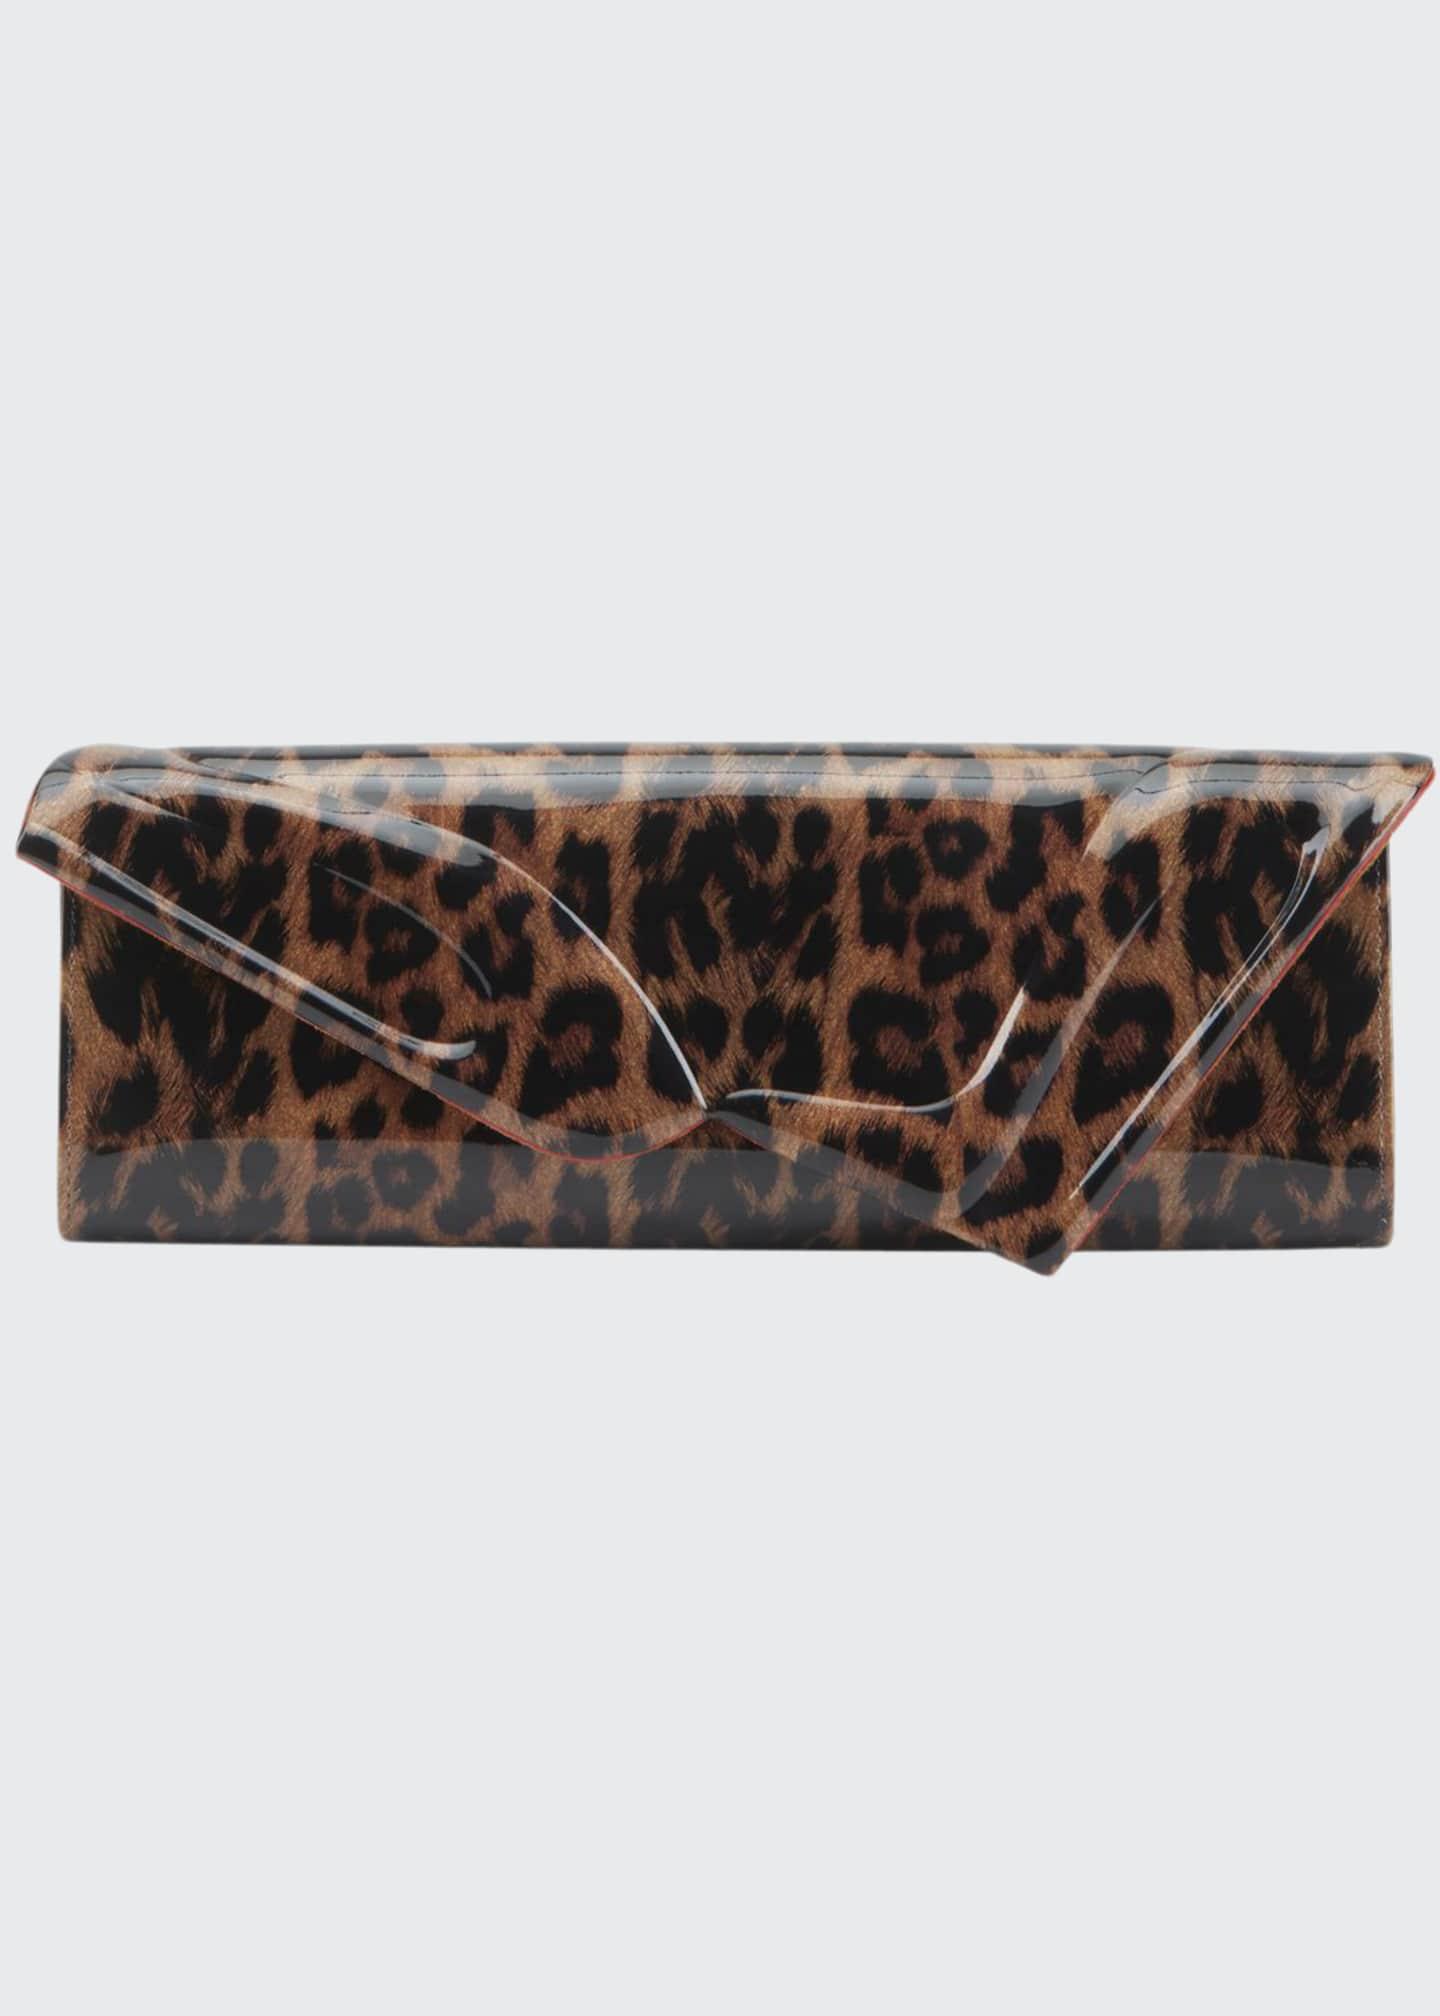 Christian Louboutin So Kate Leopard Baguette Clutch Bag